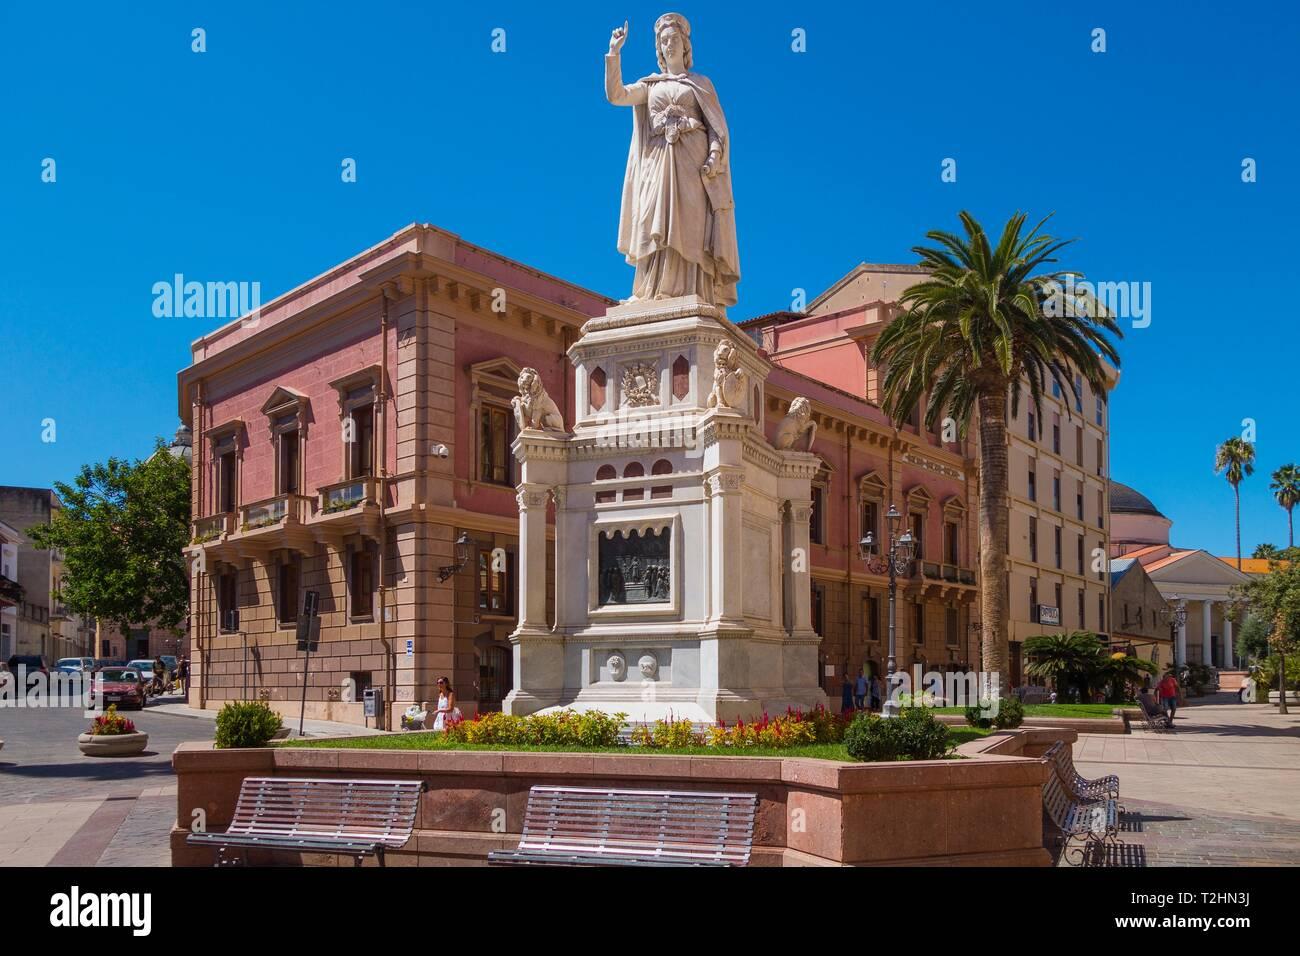 Estatua de Eleanor de Arborea en Oristano (Cerdeña, Italia), Europa Foto de stock